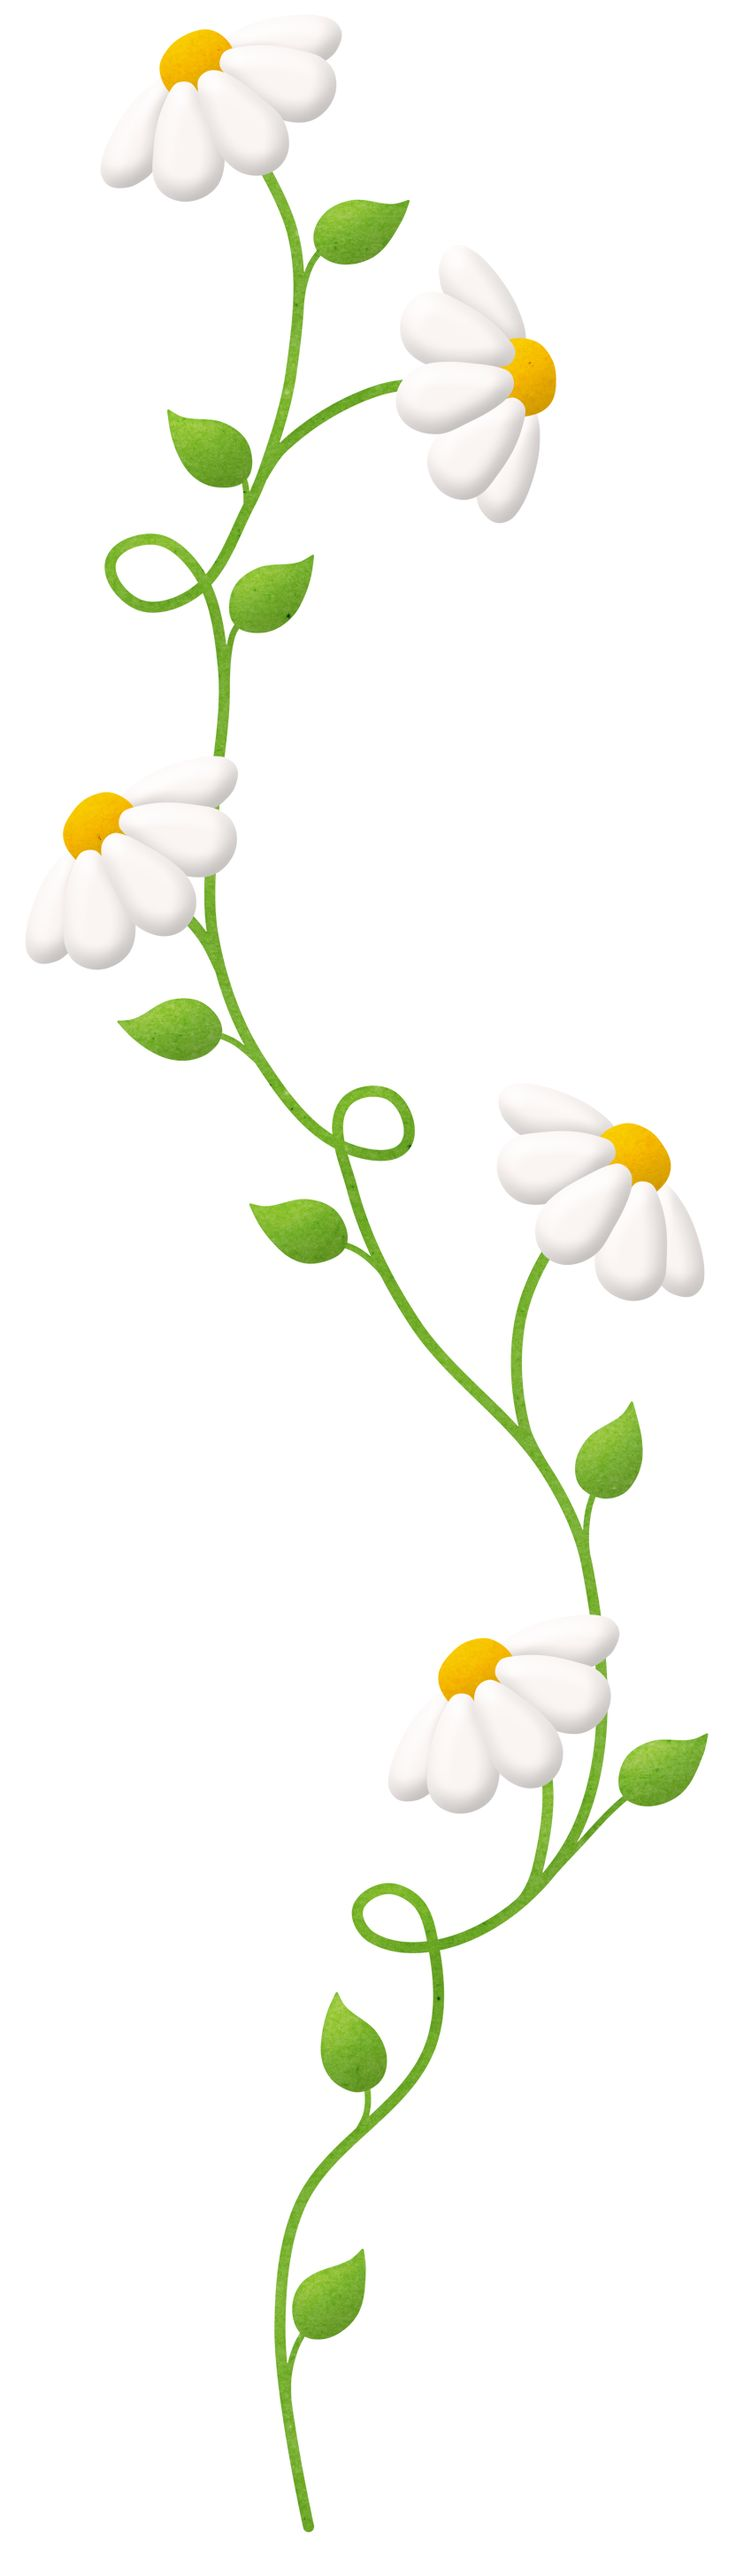 vertical flowers clipart #5